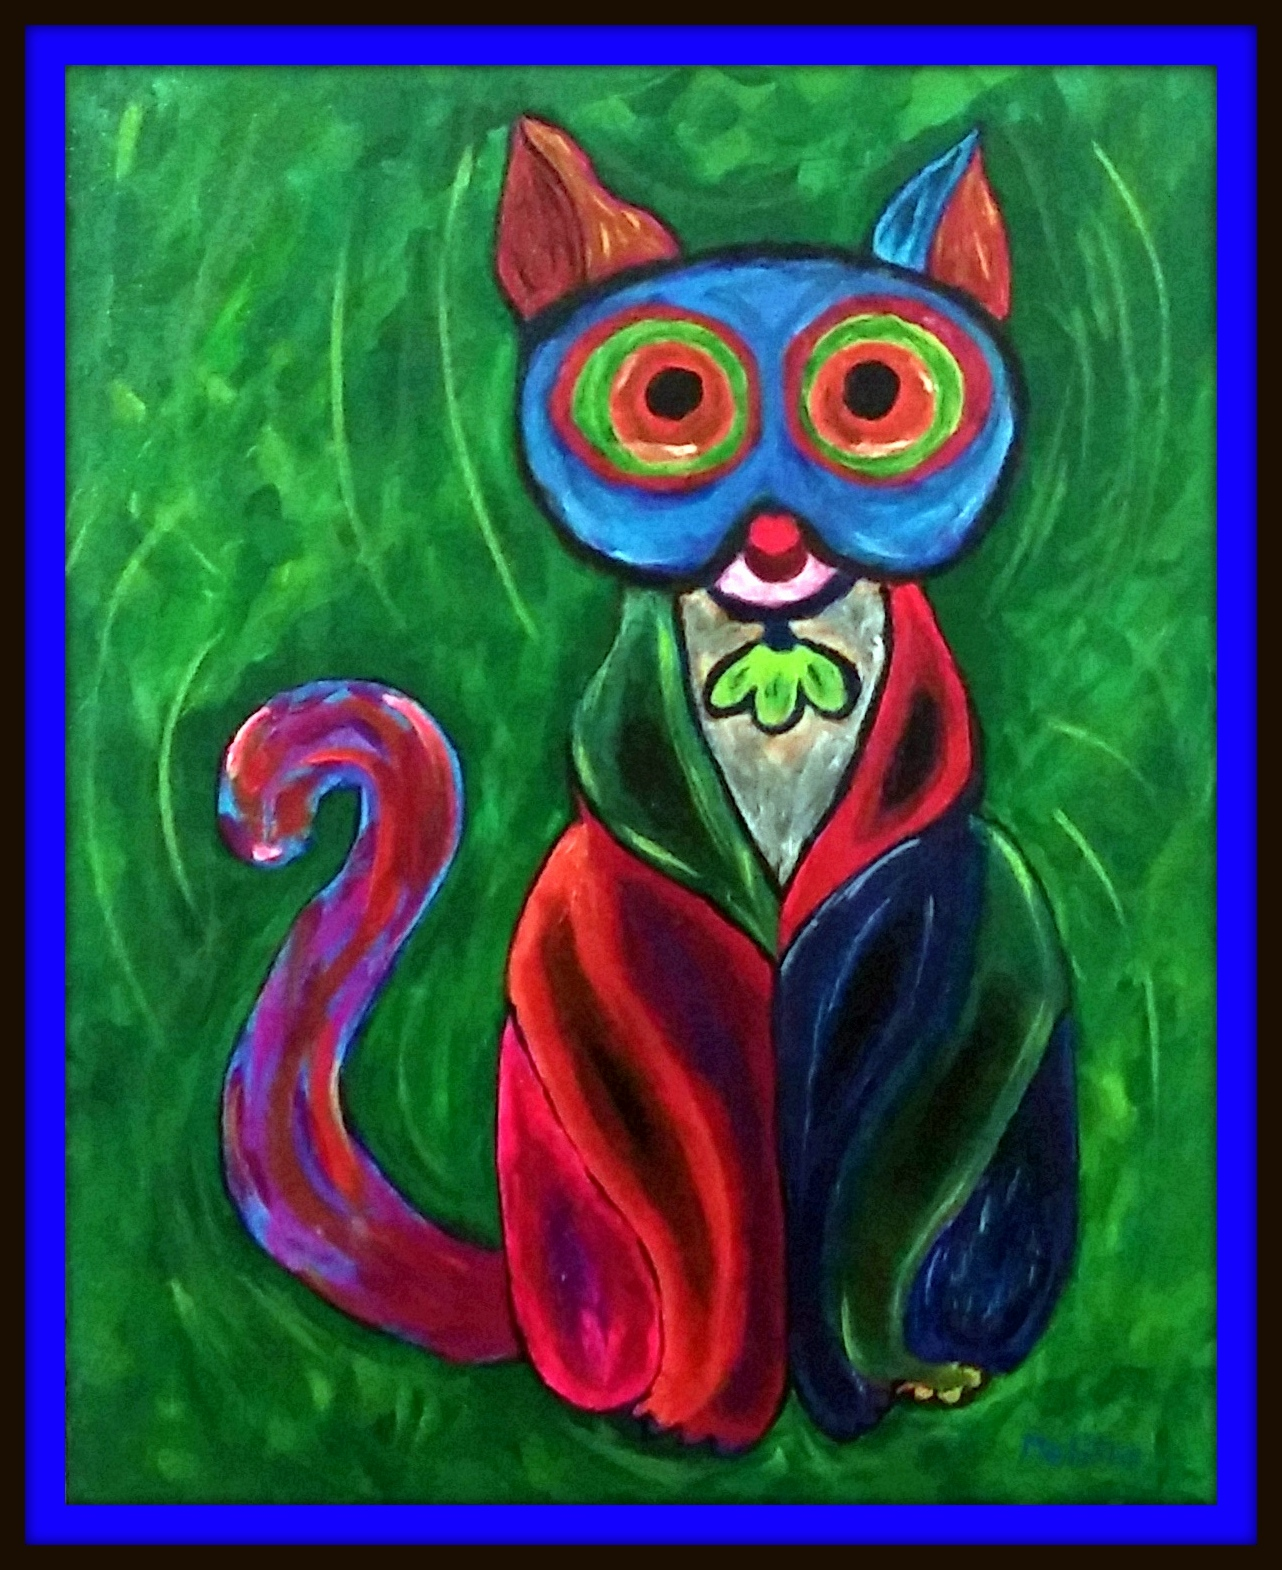 Owly Cat